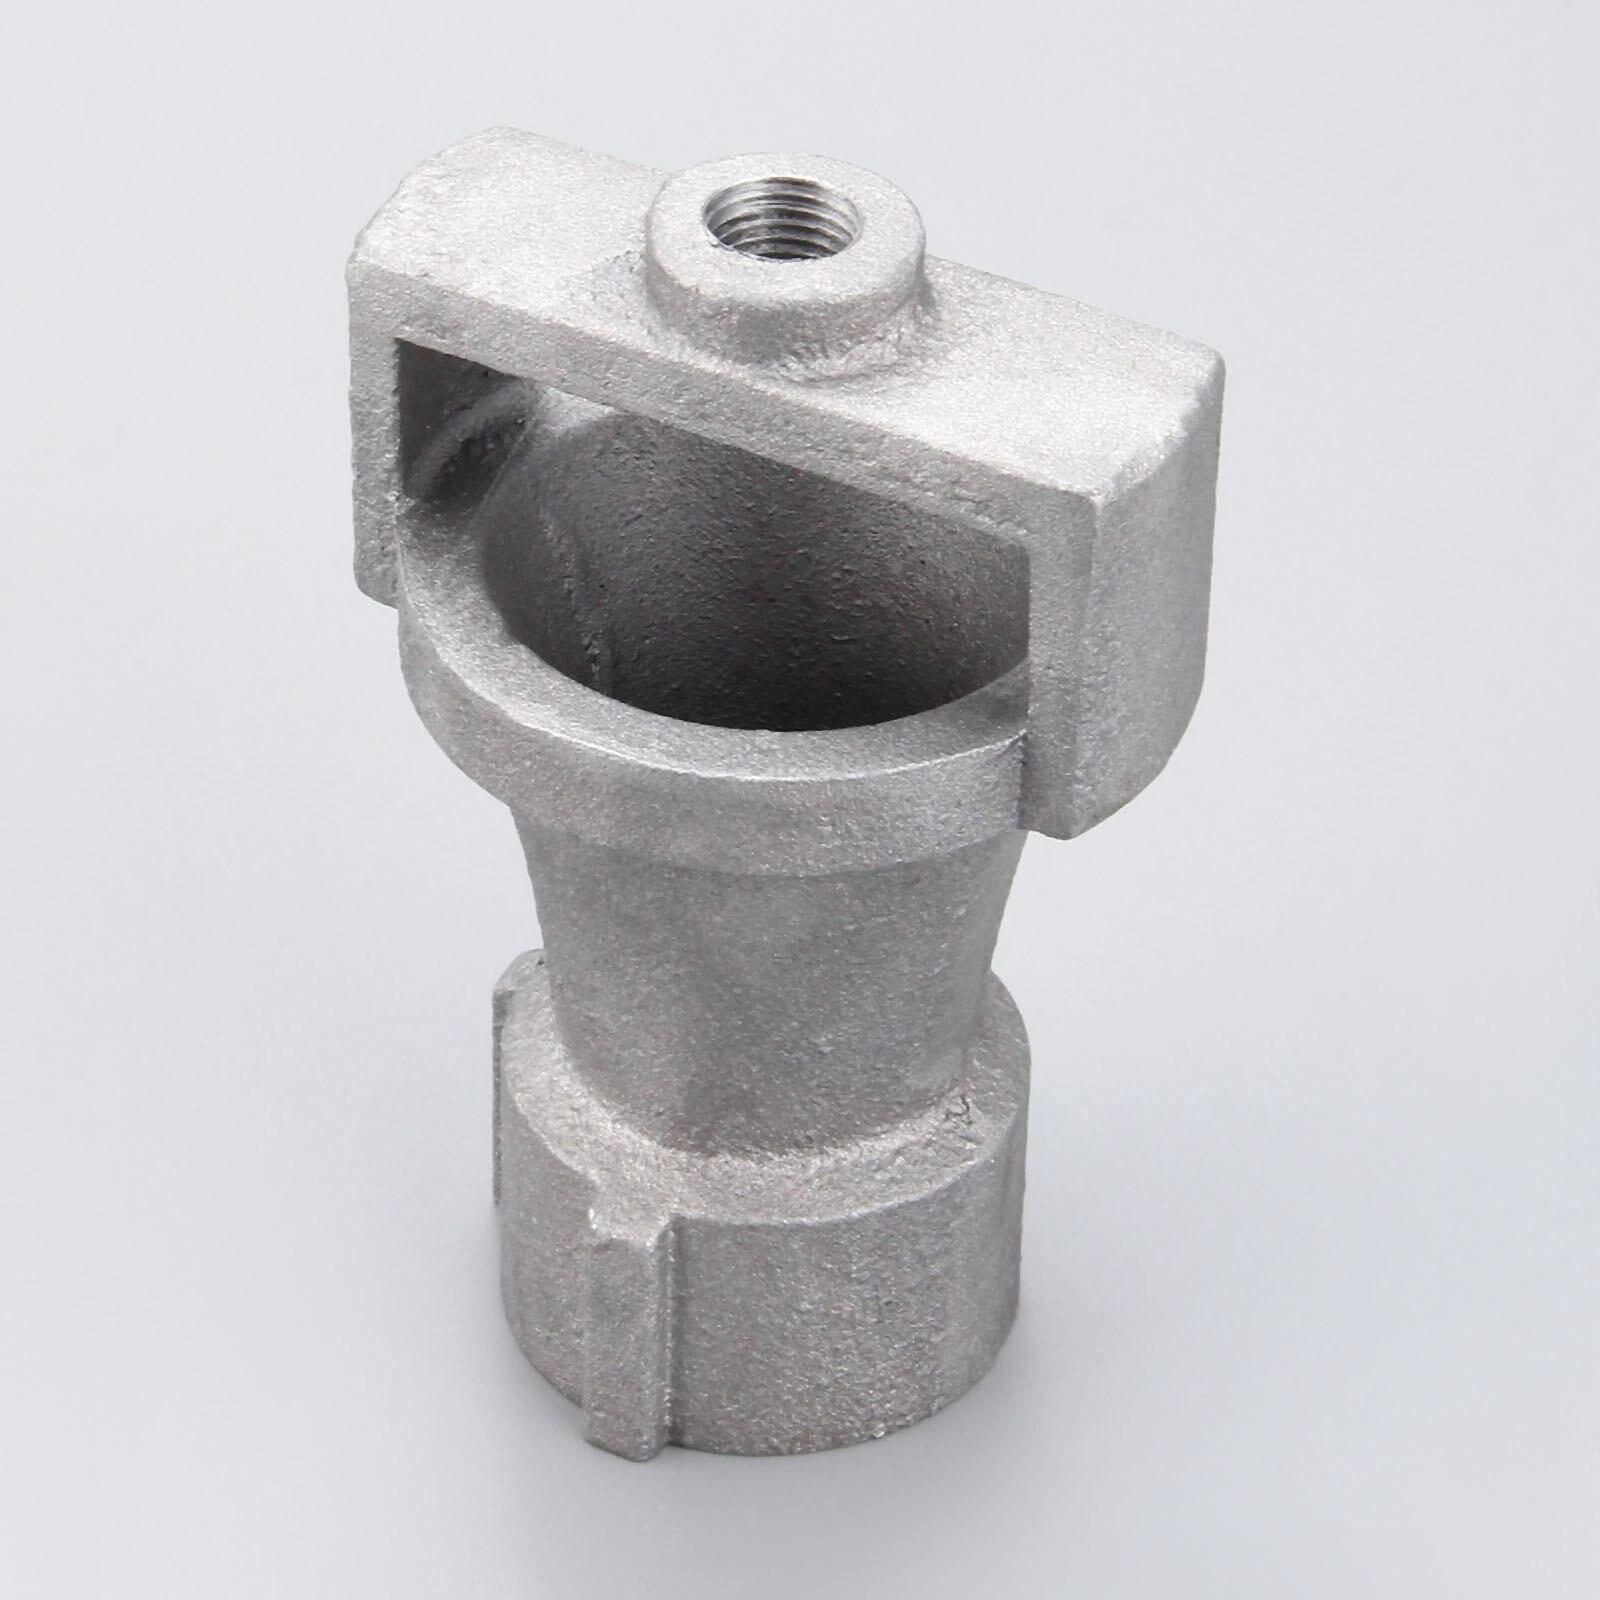 Gas Industry Boiler Heaters Burner Replacements Cast Alumium Venturi Burner Parts Inlet 1inch BSP & Outlet 1/4inch BSP